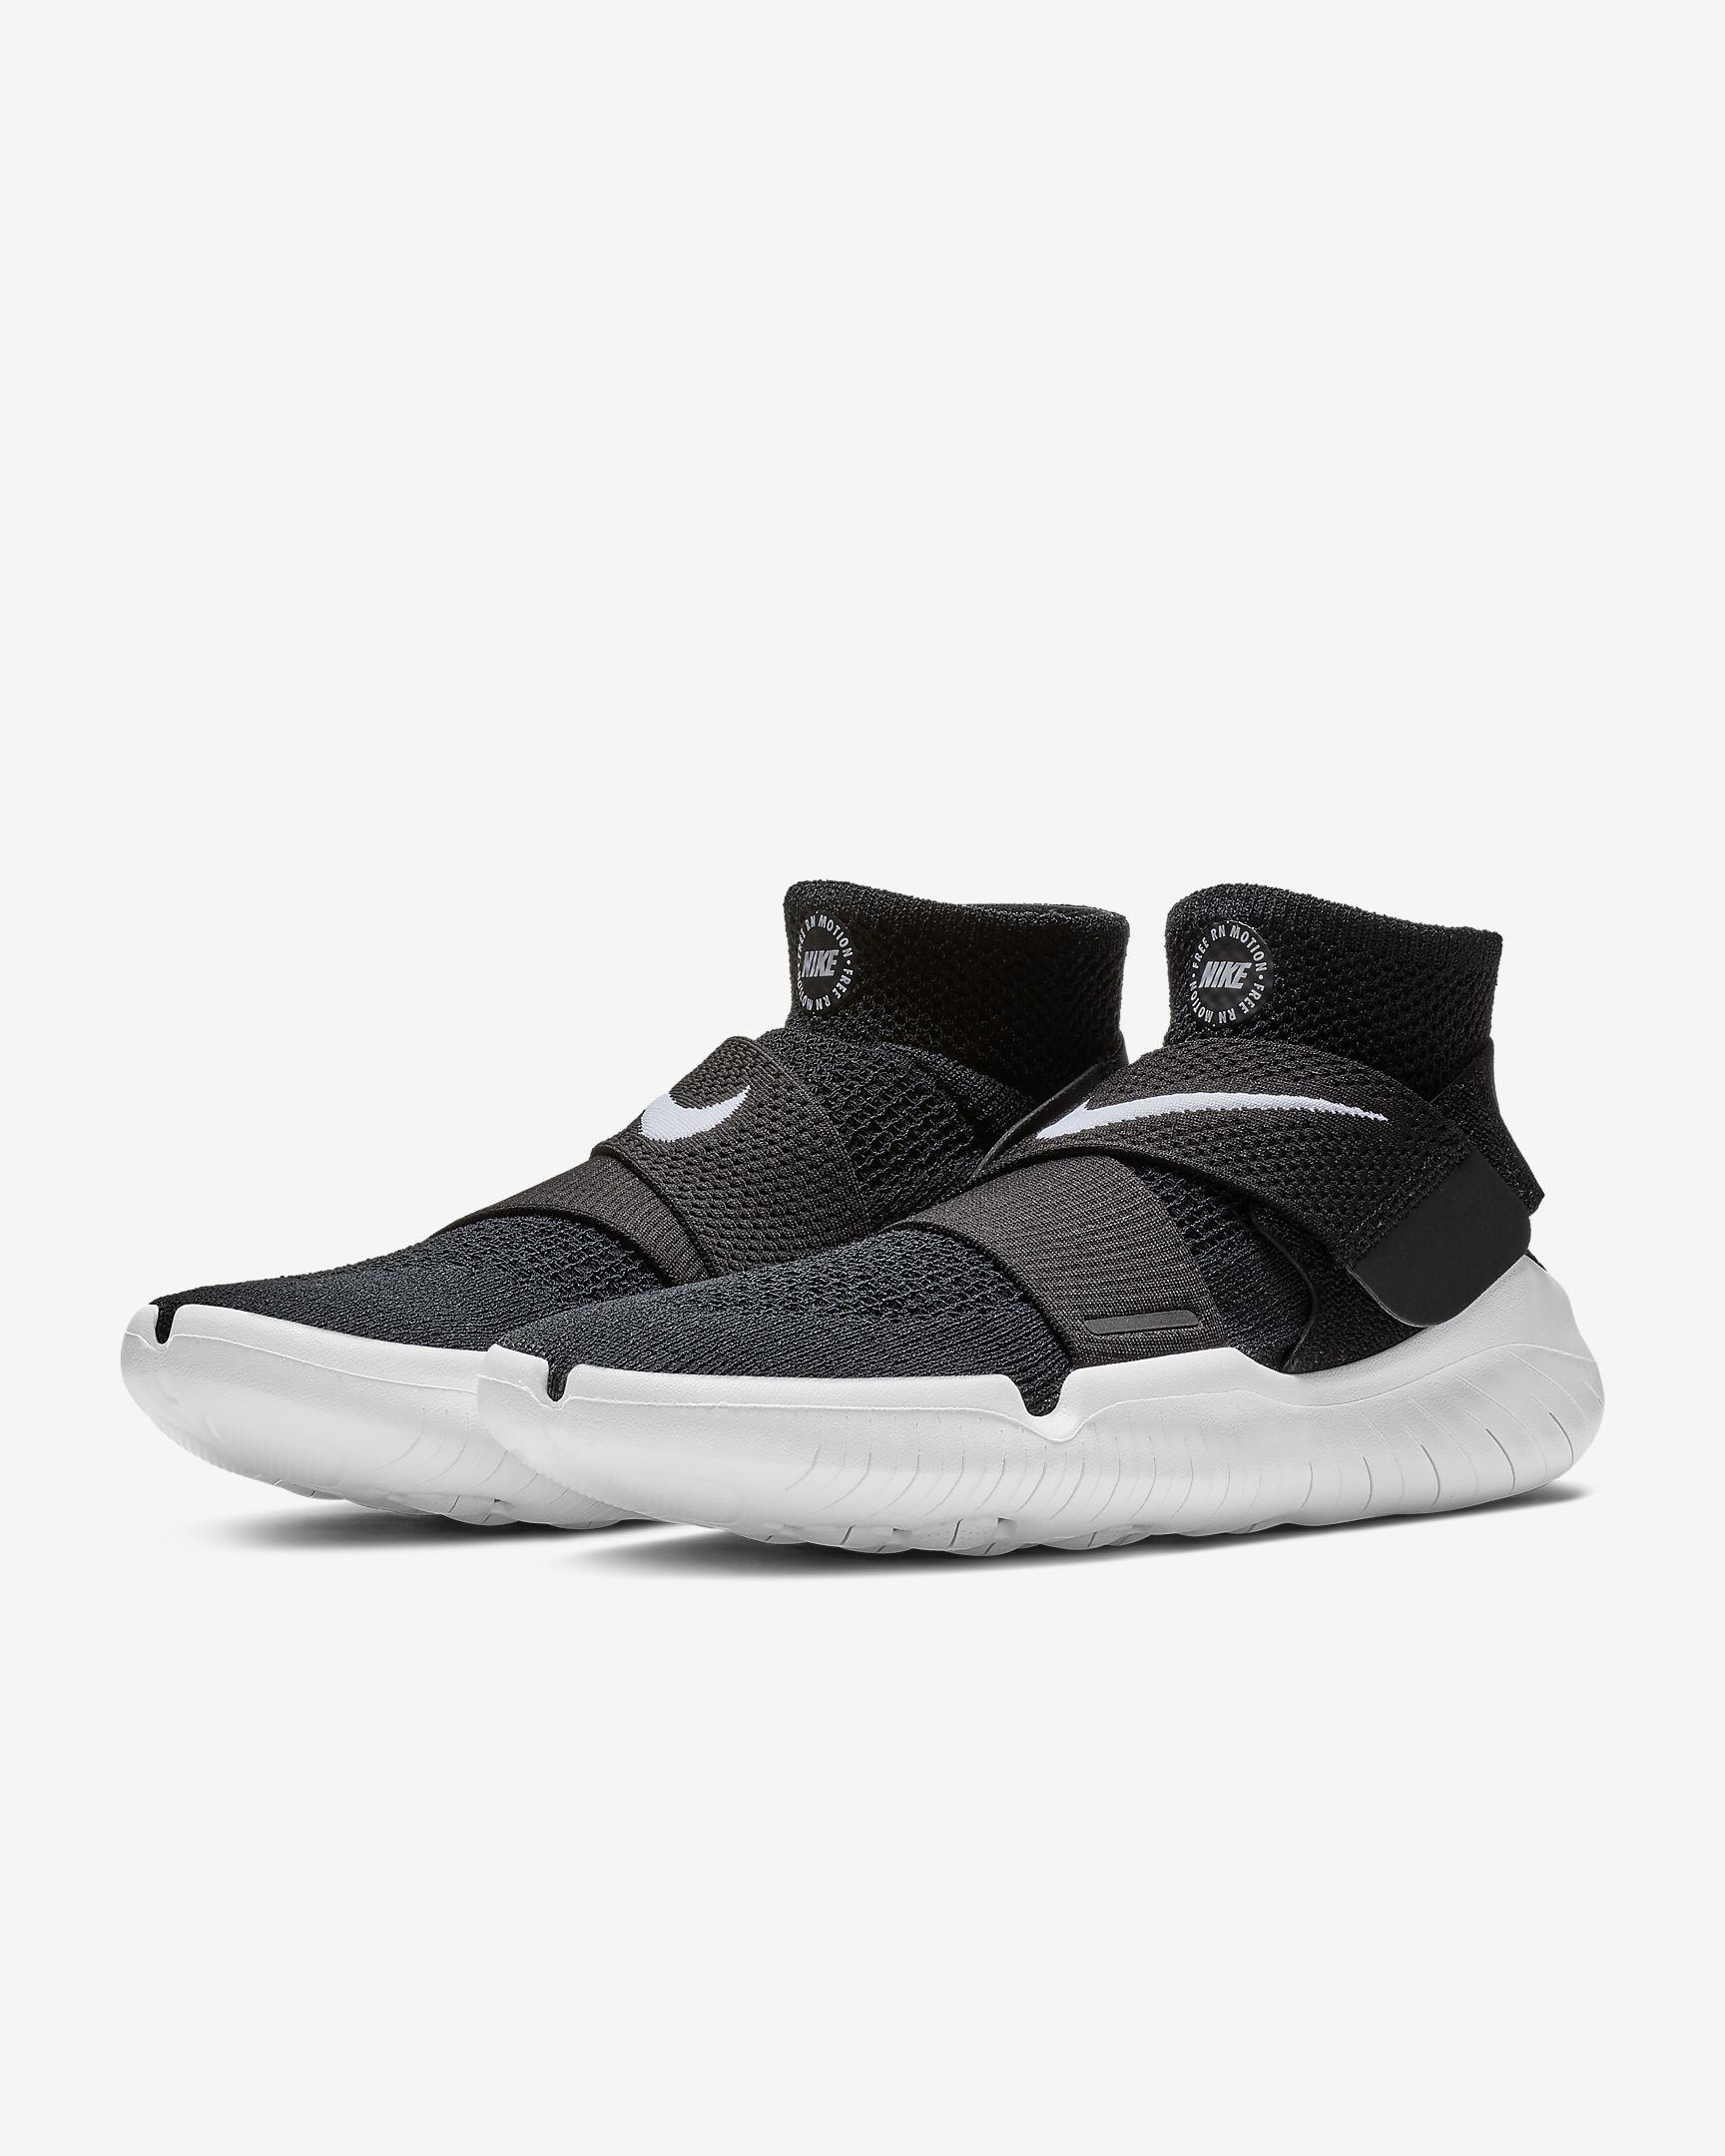 Free Rn Motion Flyknit 2018 Men S Running Shoe Running Shoes For Men Running Shoes Nike Free Nike Free Rn